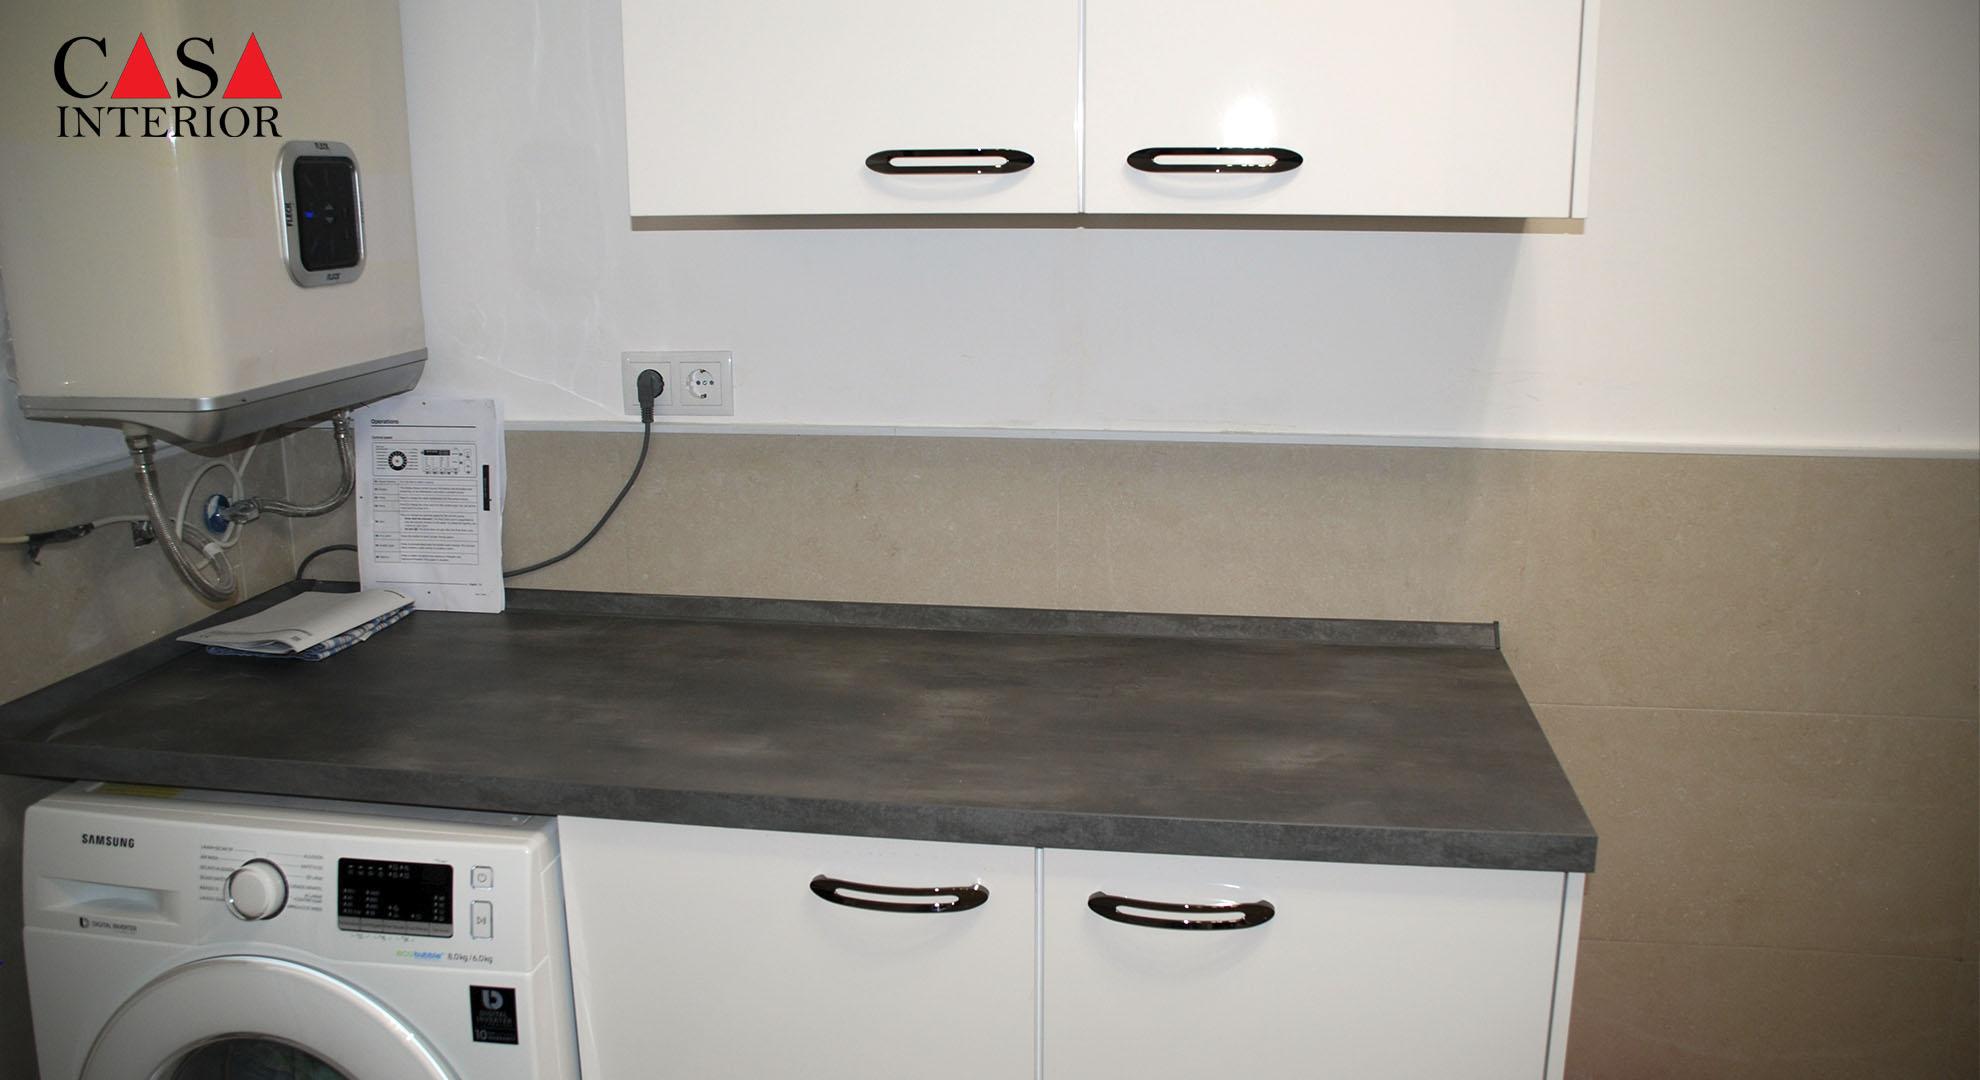 Küchentime Flash Alpine White High Gloss Alfaz del Pi - Laundry Room (2)